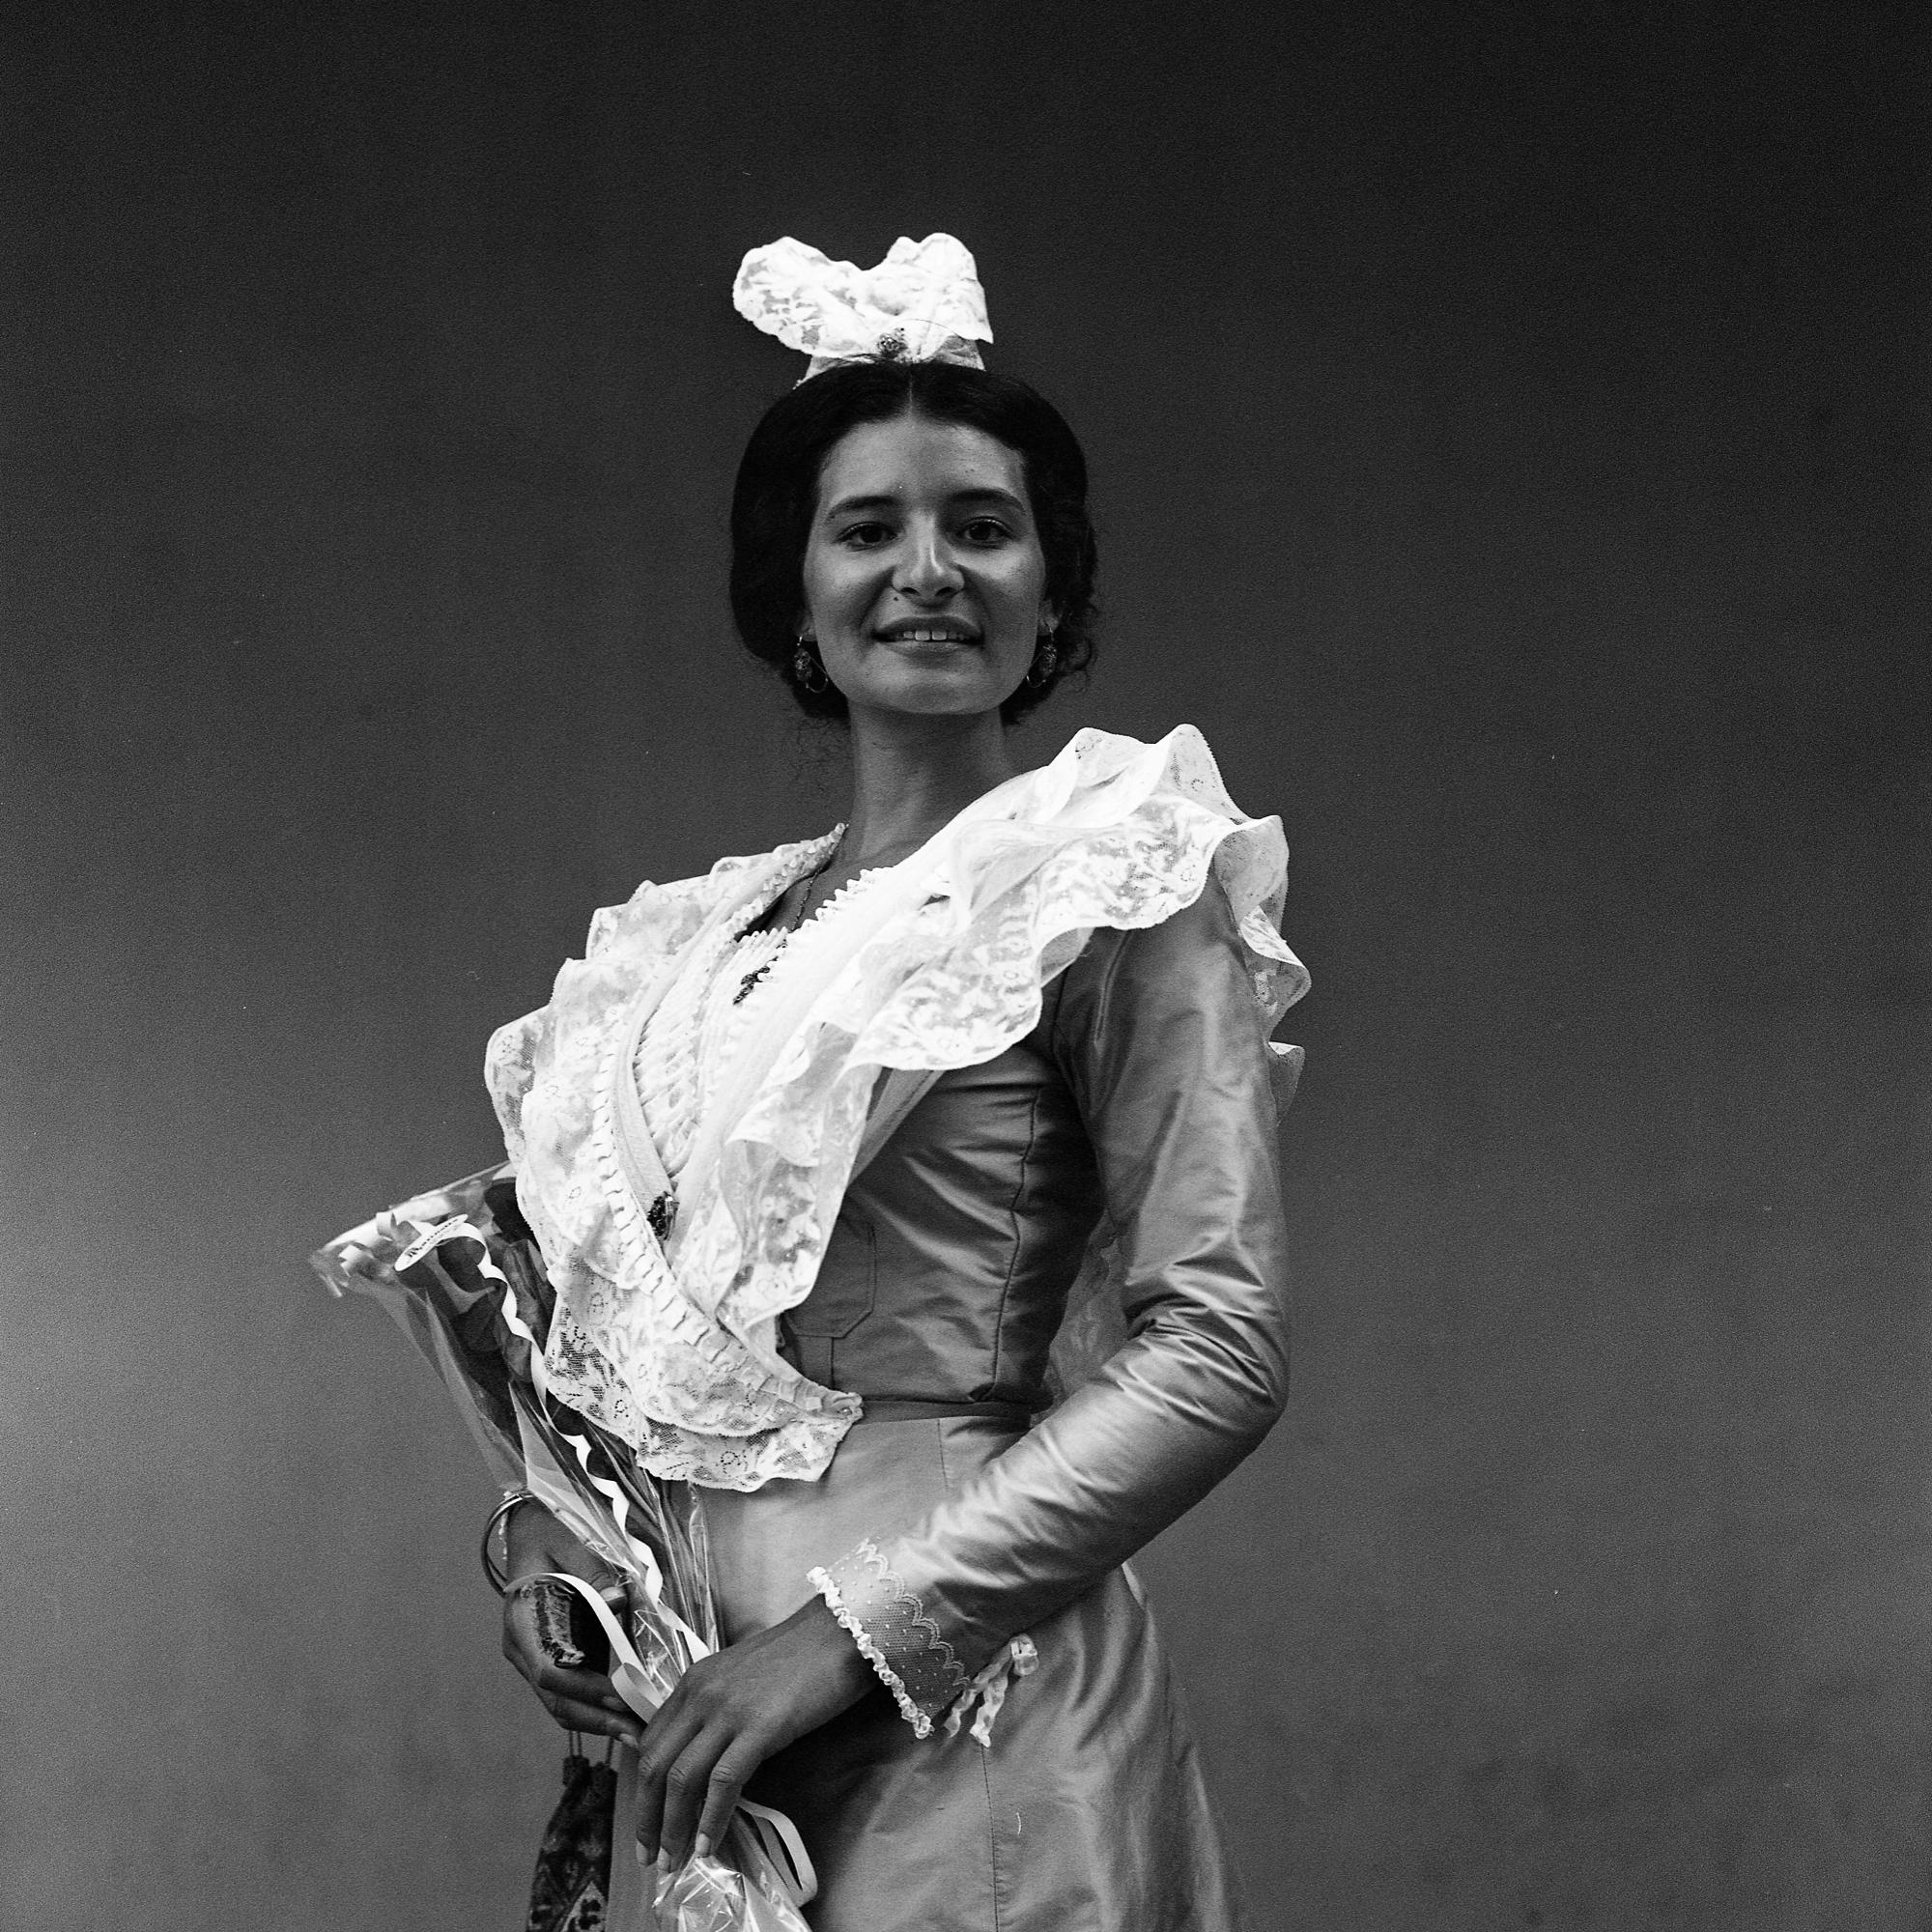 (c) Priscilla Stanley - Portraits4